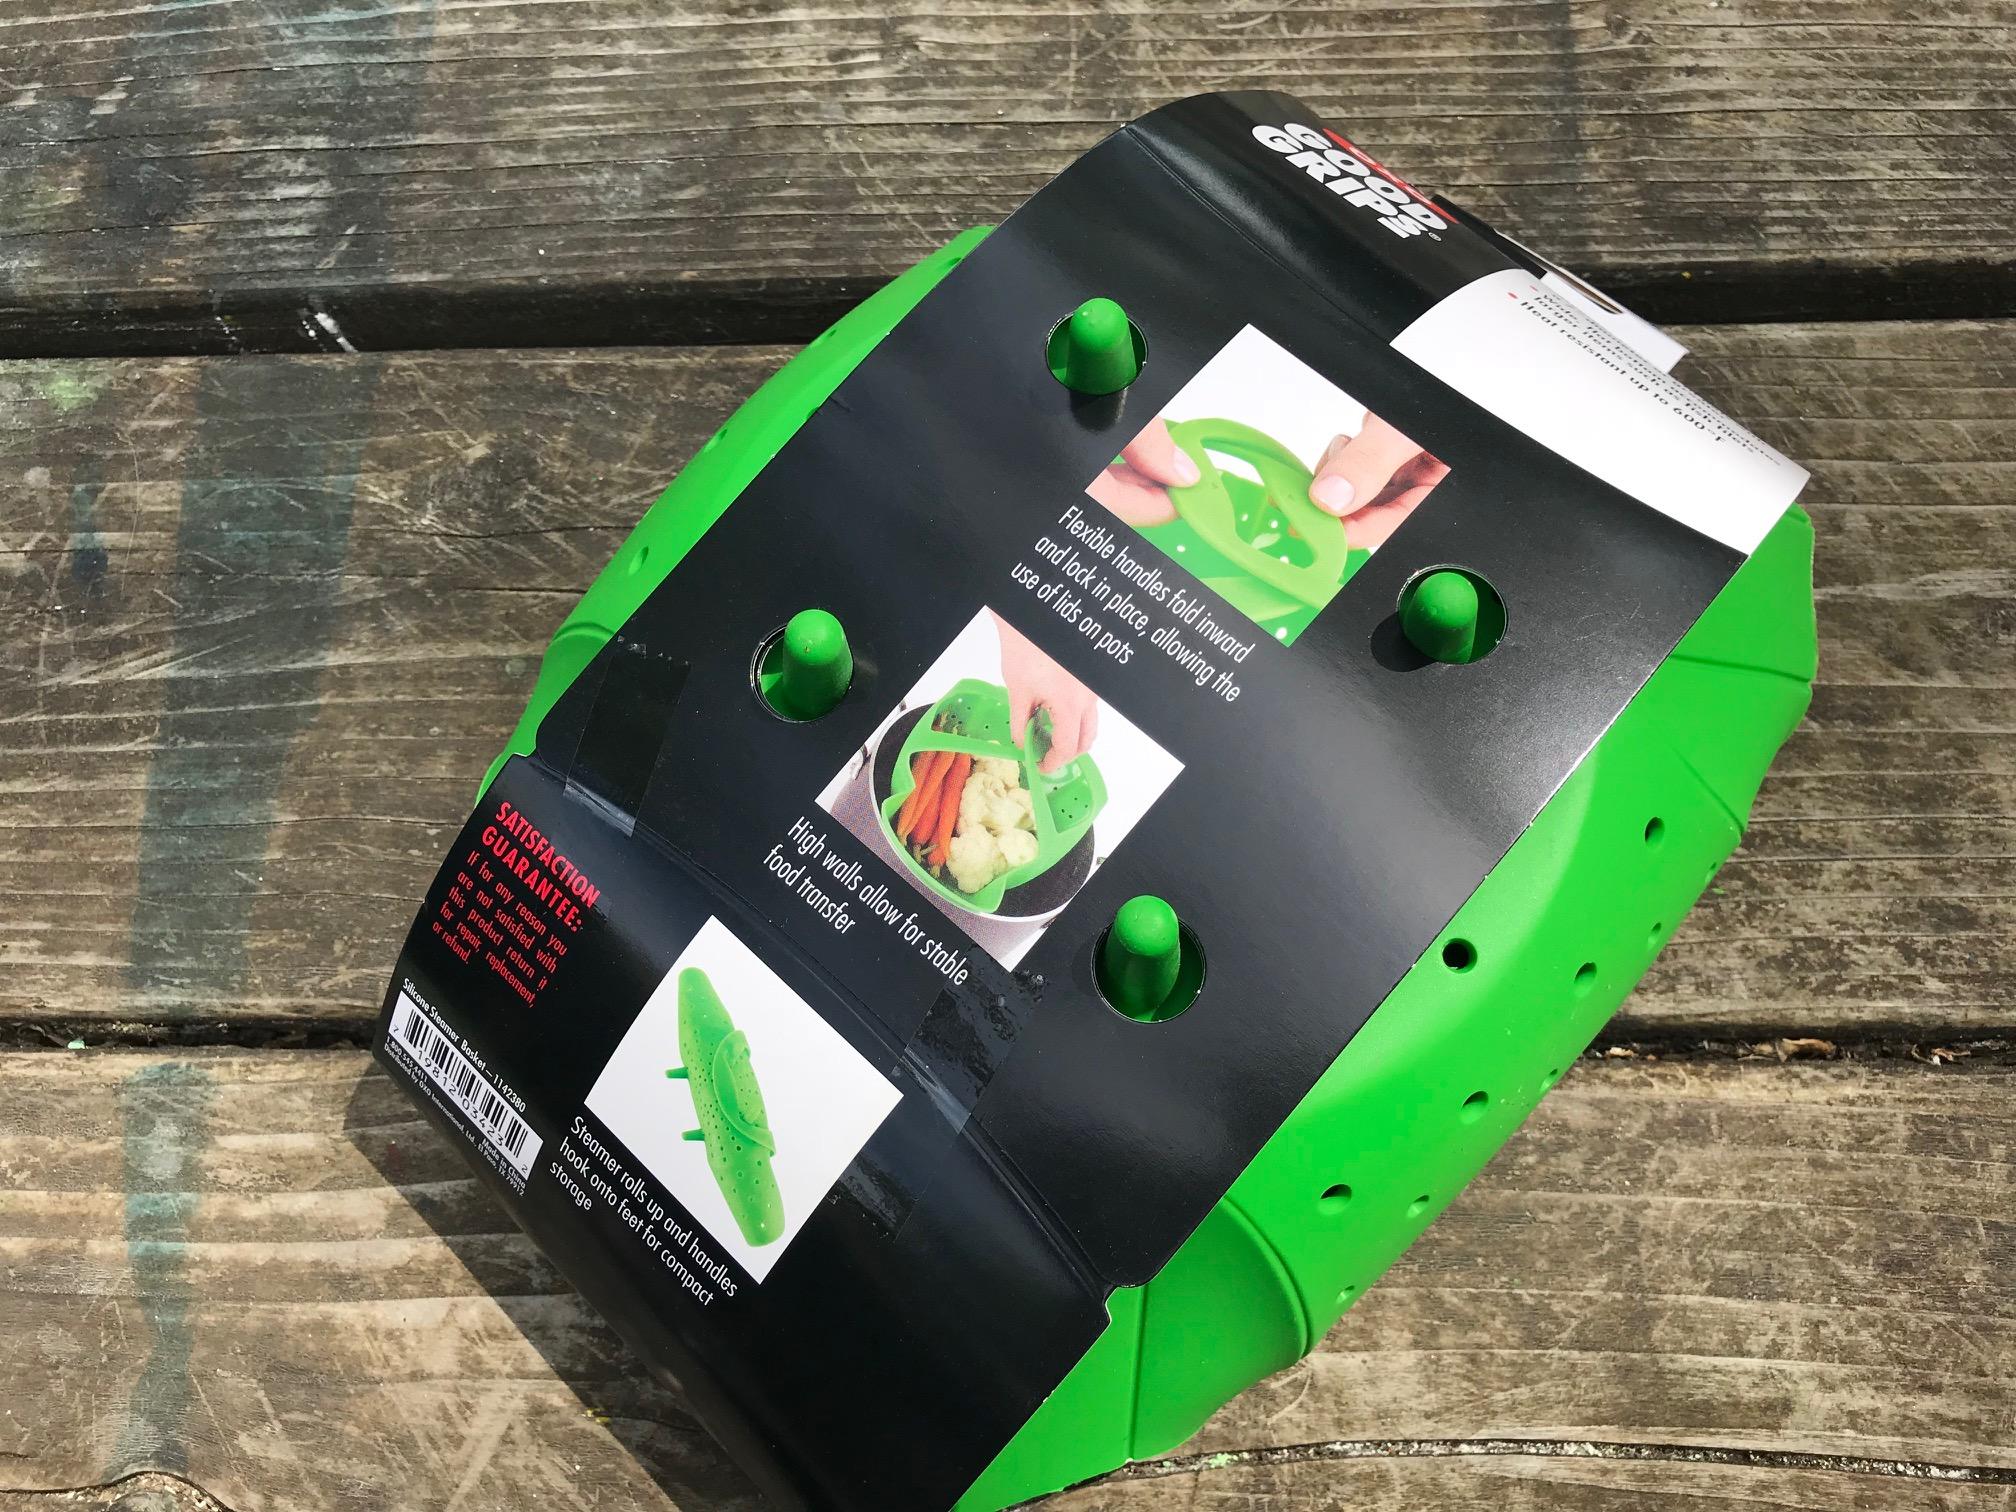 2018 OXO Good Grips Green Silicone Steamer Basket